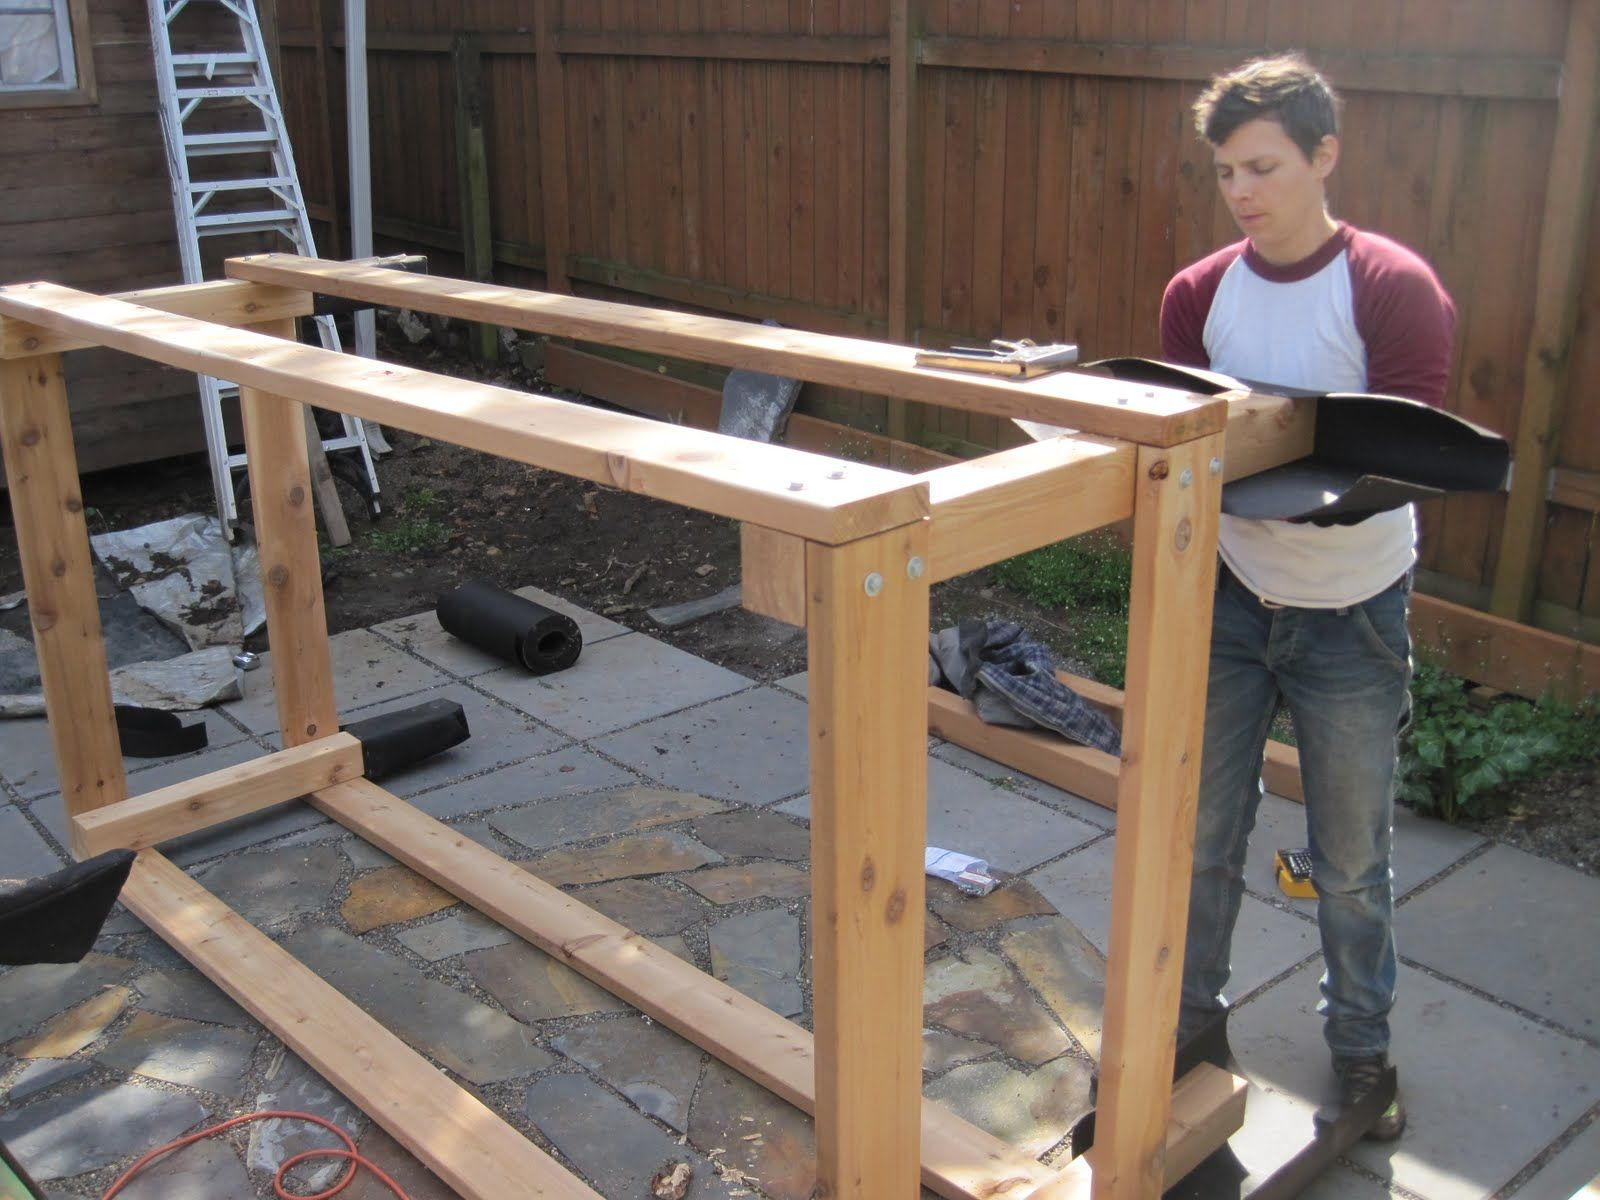 Corrugated Metal Raised Bed | CEDAR U0026 METAL RAISED BED PROJECT